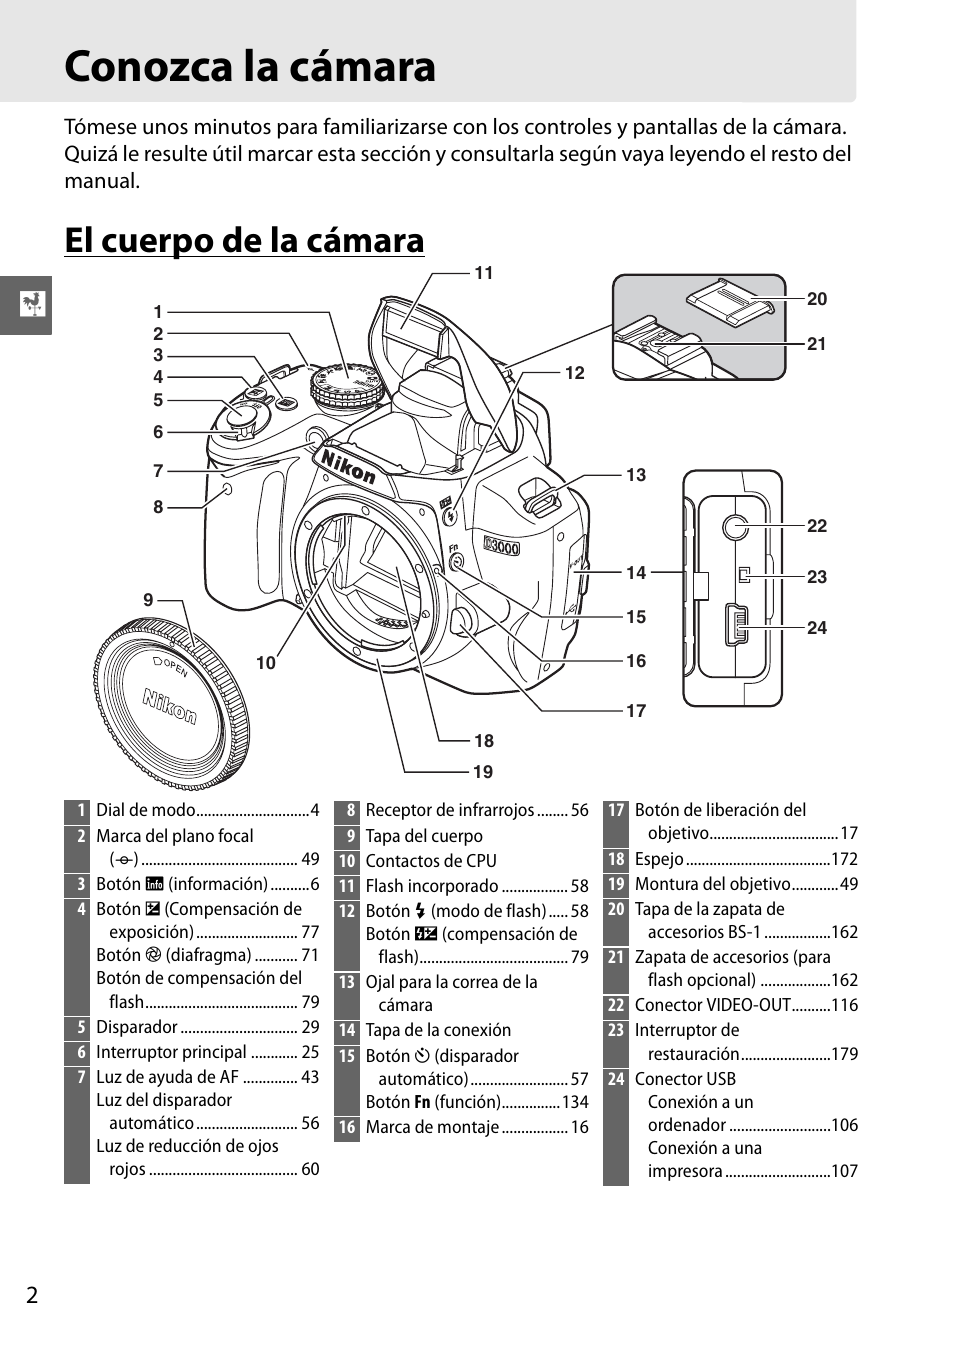 conozca la c mara el cuerpo de la c mara nikon d3000 manual del rh pdfmanuales com manual de uso nikon d3000 manual de usuario nikon d3000